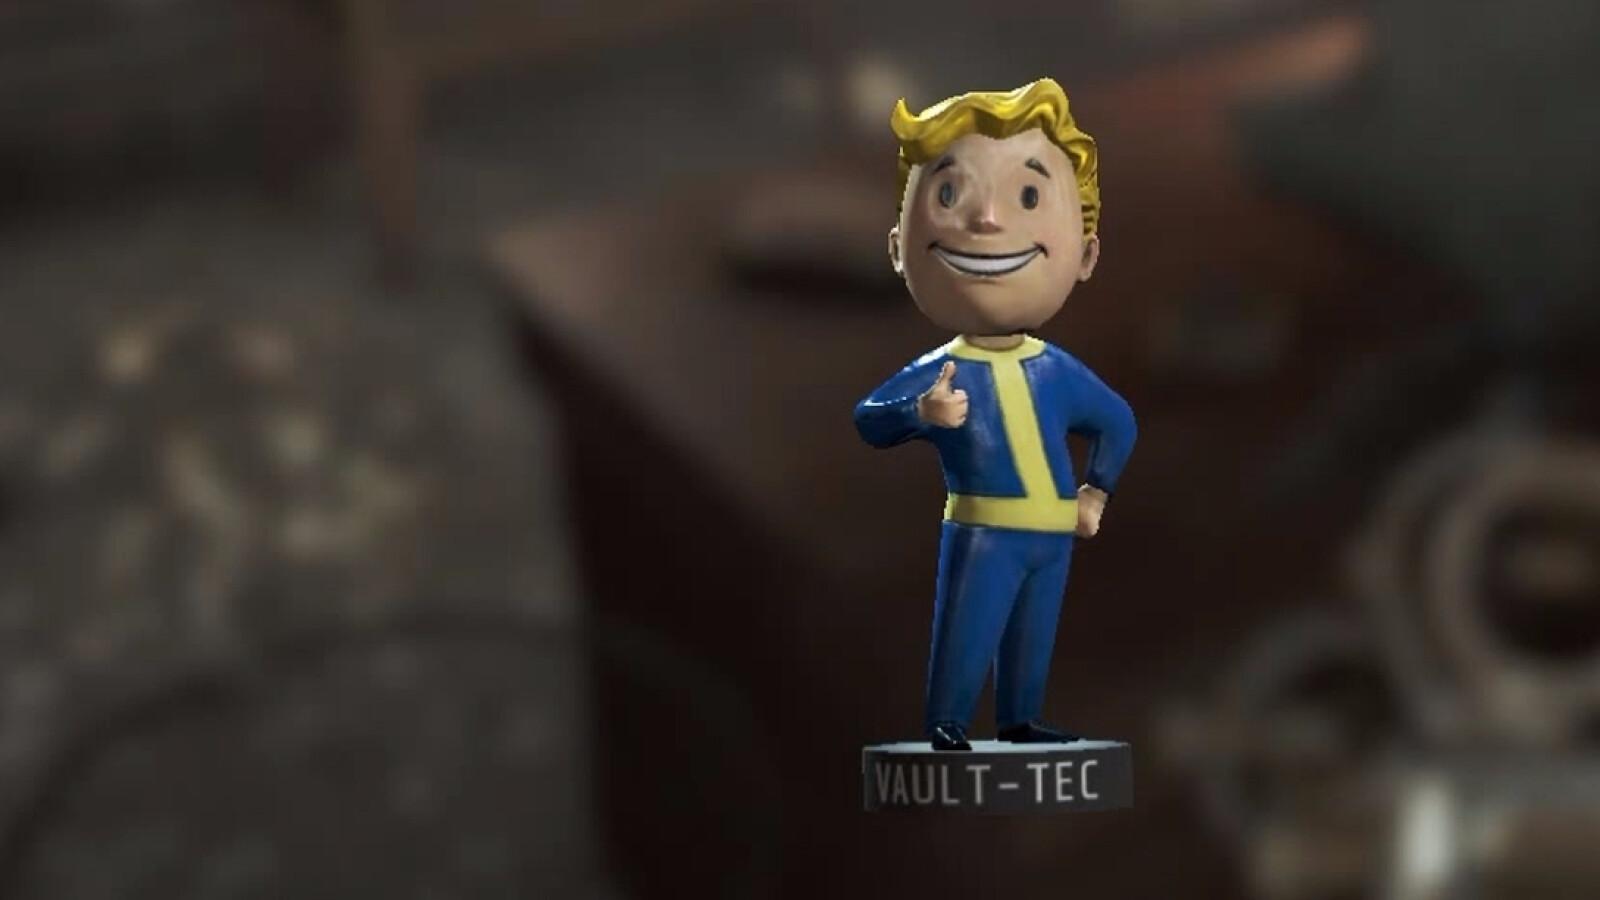 Fallout 4 Wackelpuppen Karte.Fallout 4 Alle Bobbleheads Mit Fundorten Im Video Netzwelt